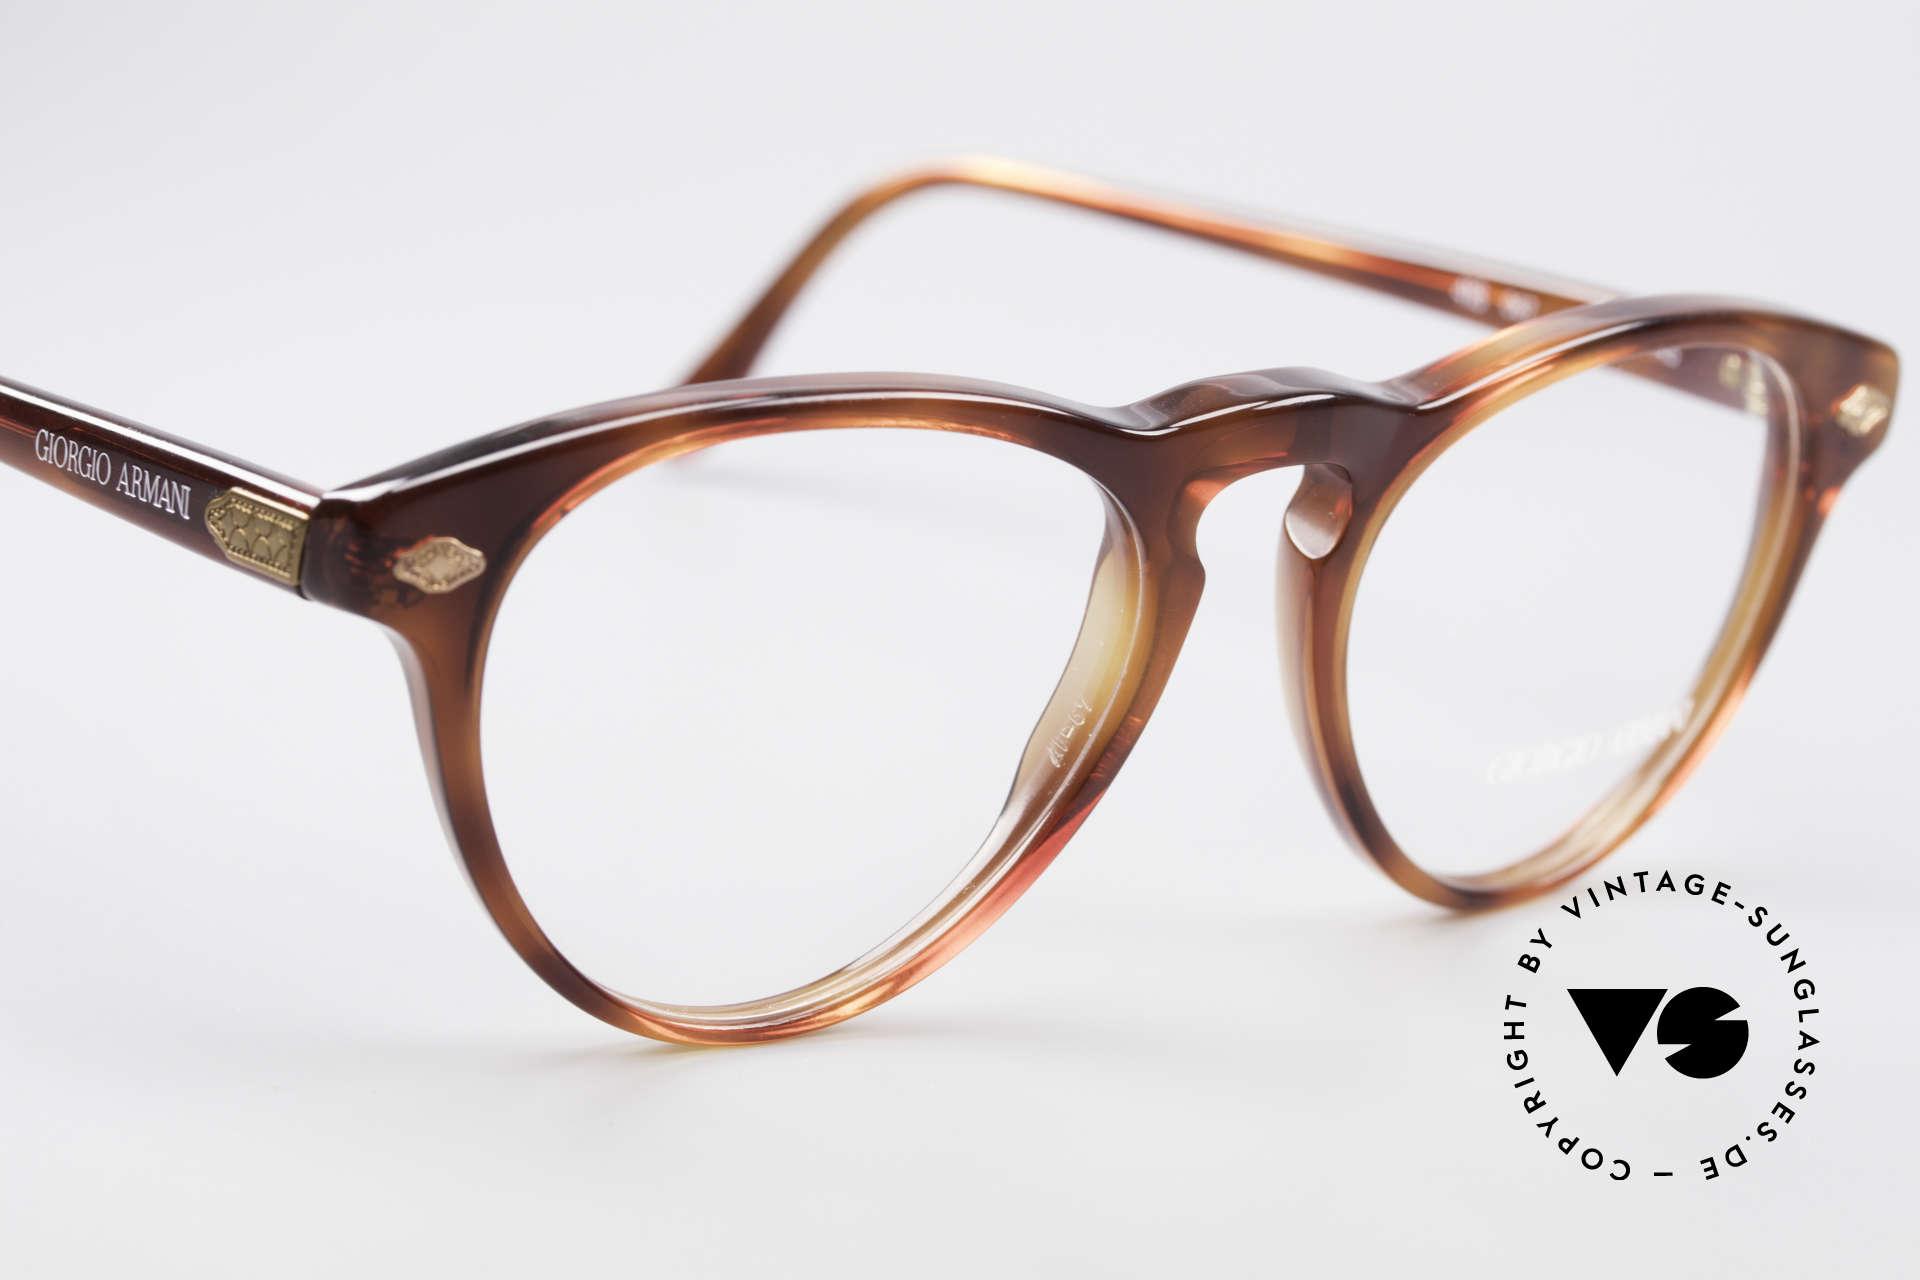 Giorgio Armani 418 Strawberry Shape Eyeglasses, unworn (like all our vintage Giorgio Armani specs), Made for Men and Women